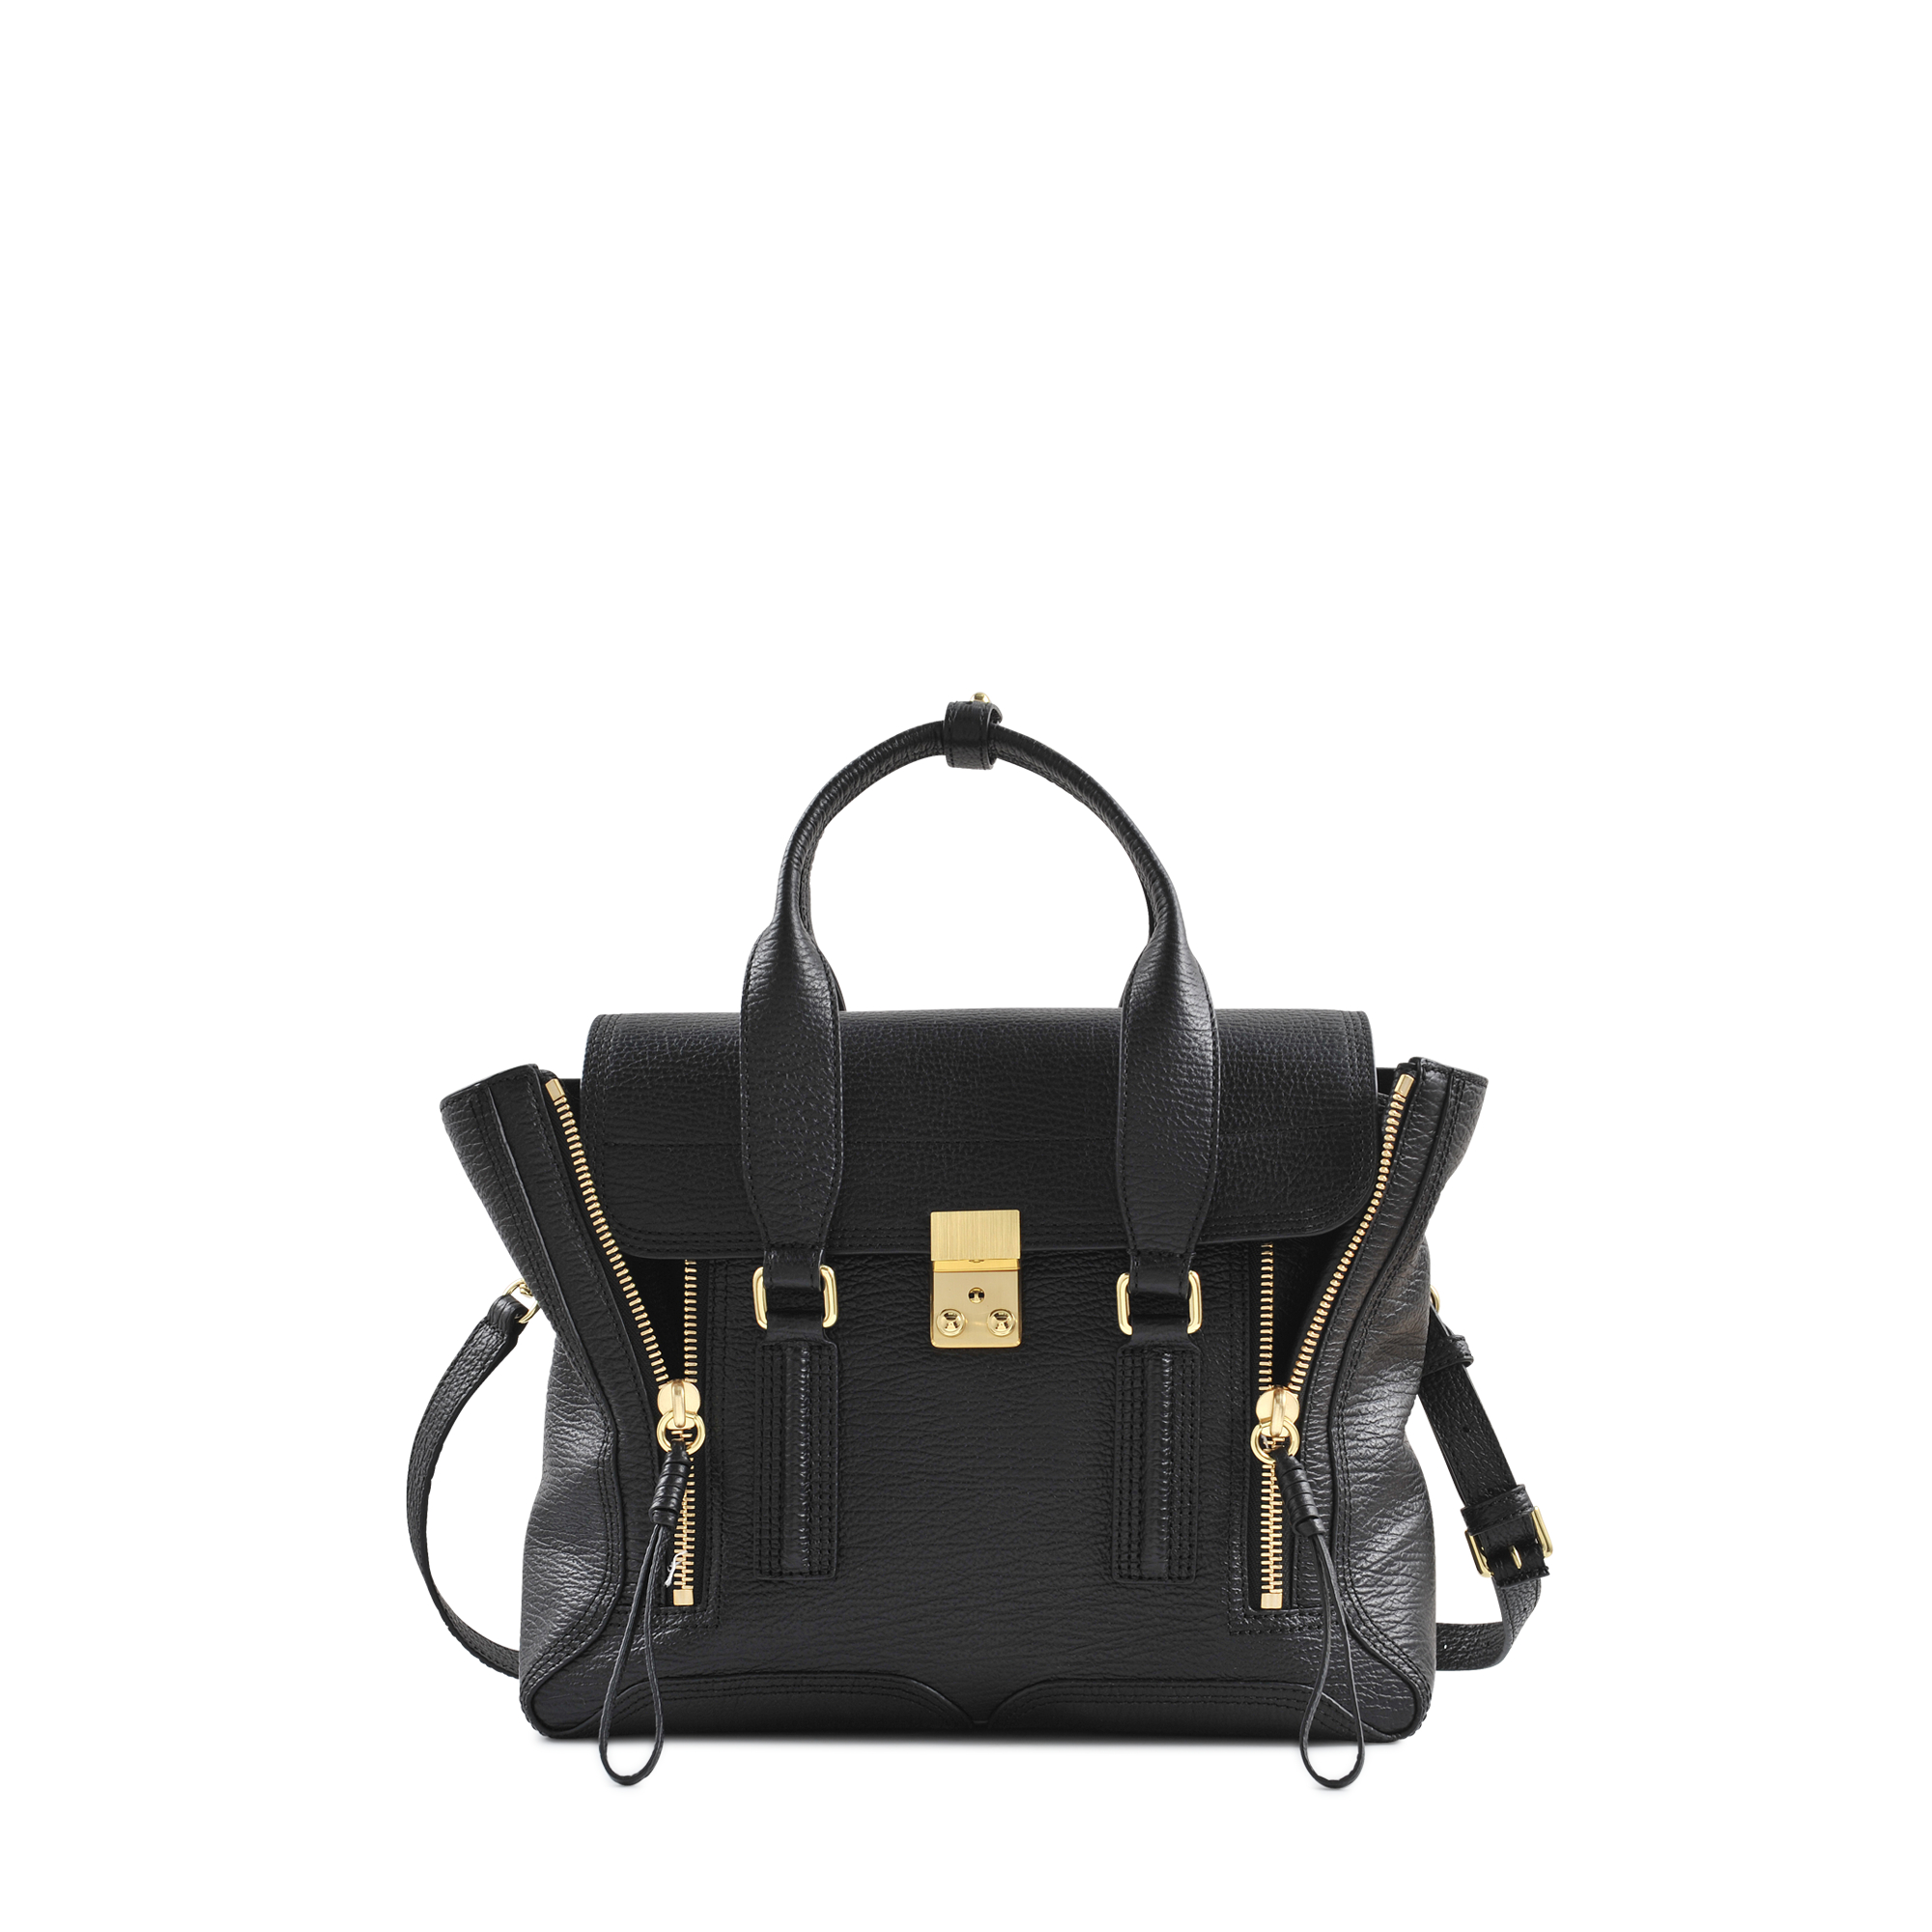 Chloe Black Bag phillip lim Pashli Medium Satchel in Black | Lyst